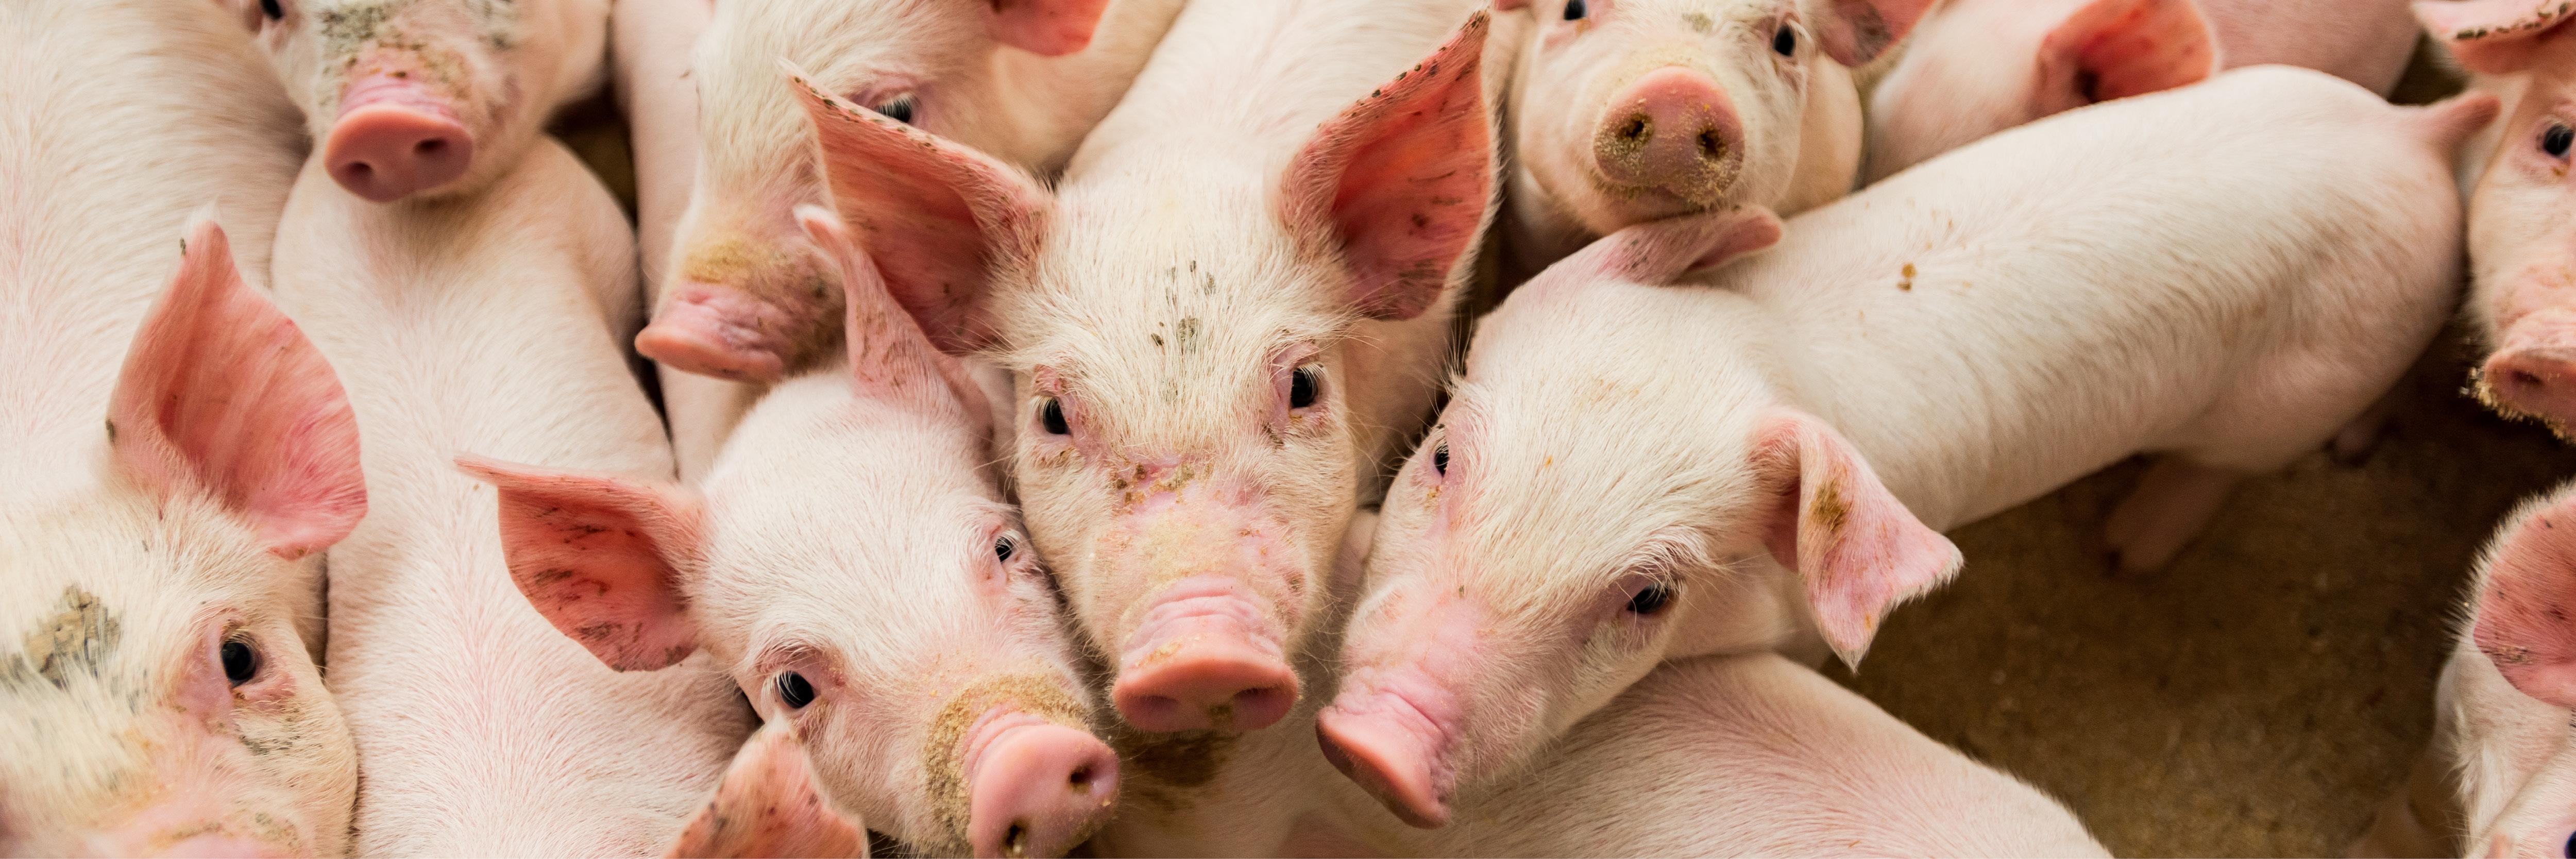 Profitability Returns to Hog Market